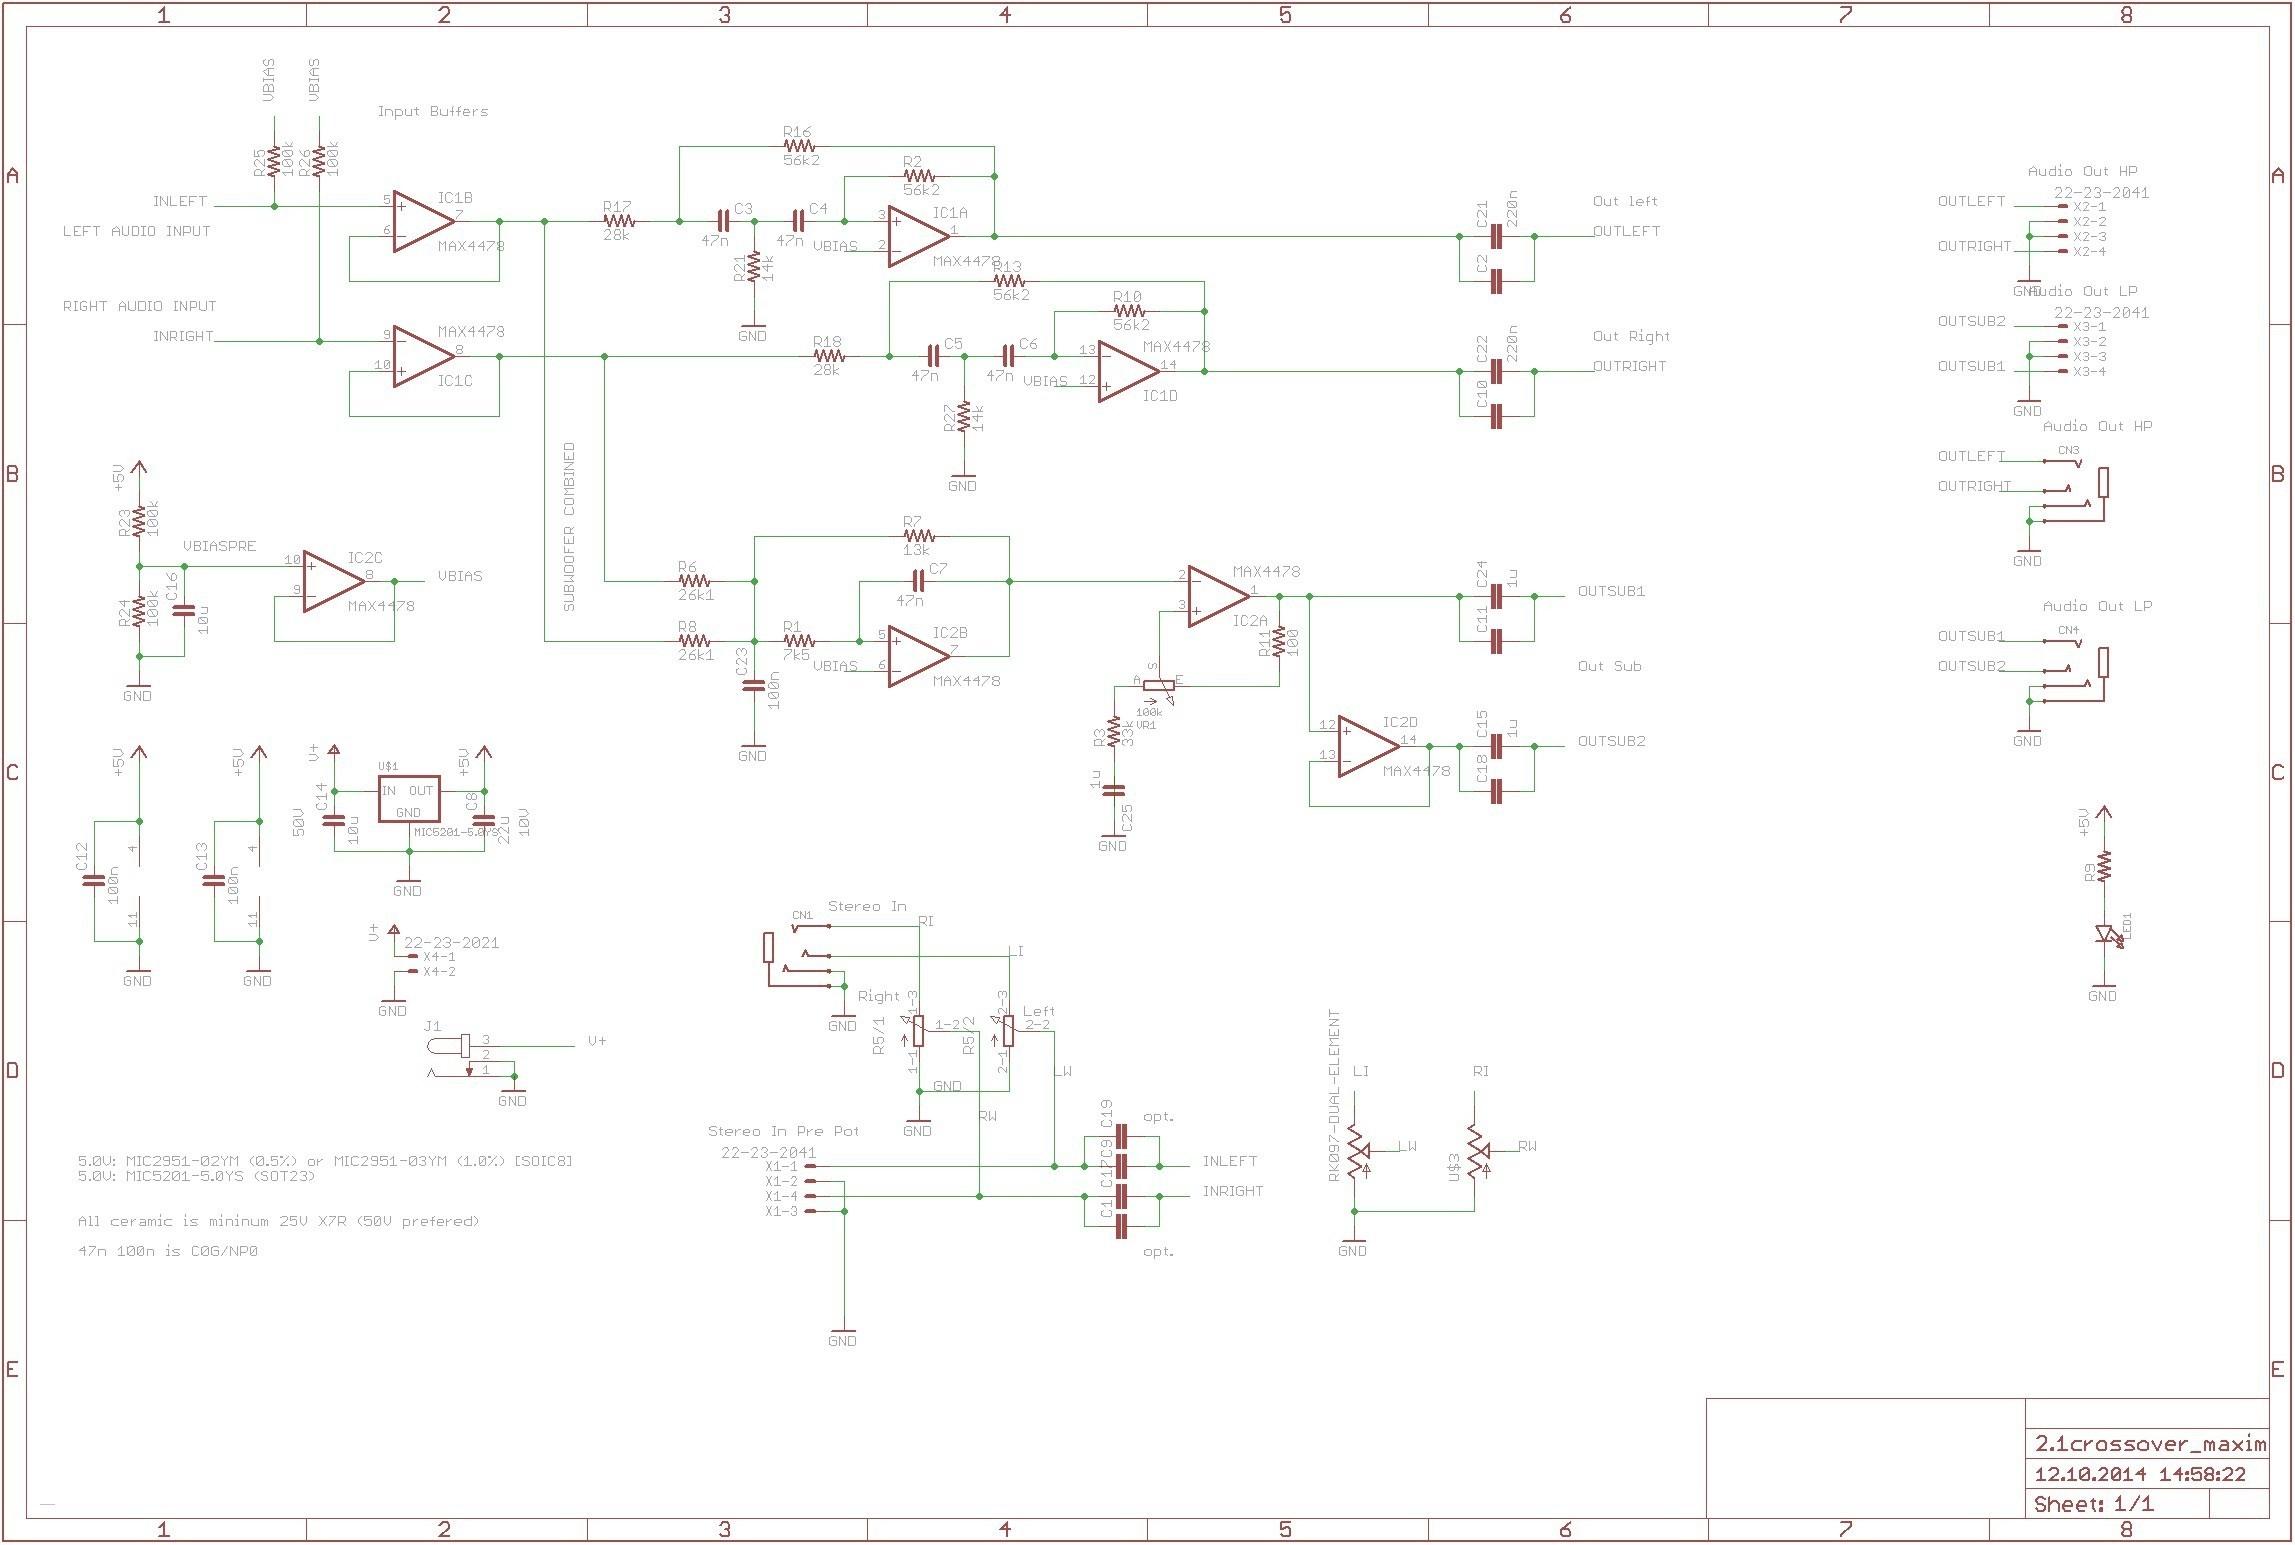 Basic Wiring Diagram Symbols Free Electrical Diagrams Legend Elegant Residential 4i